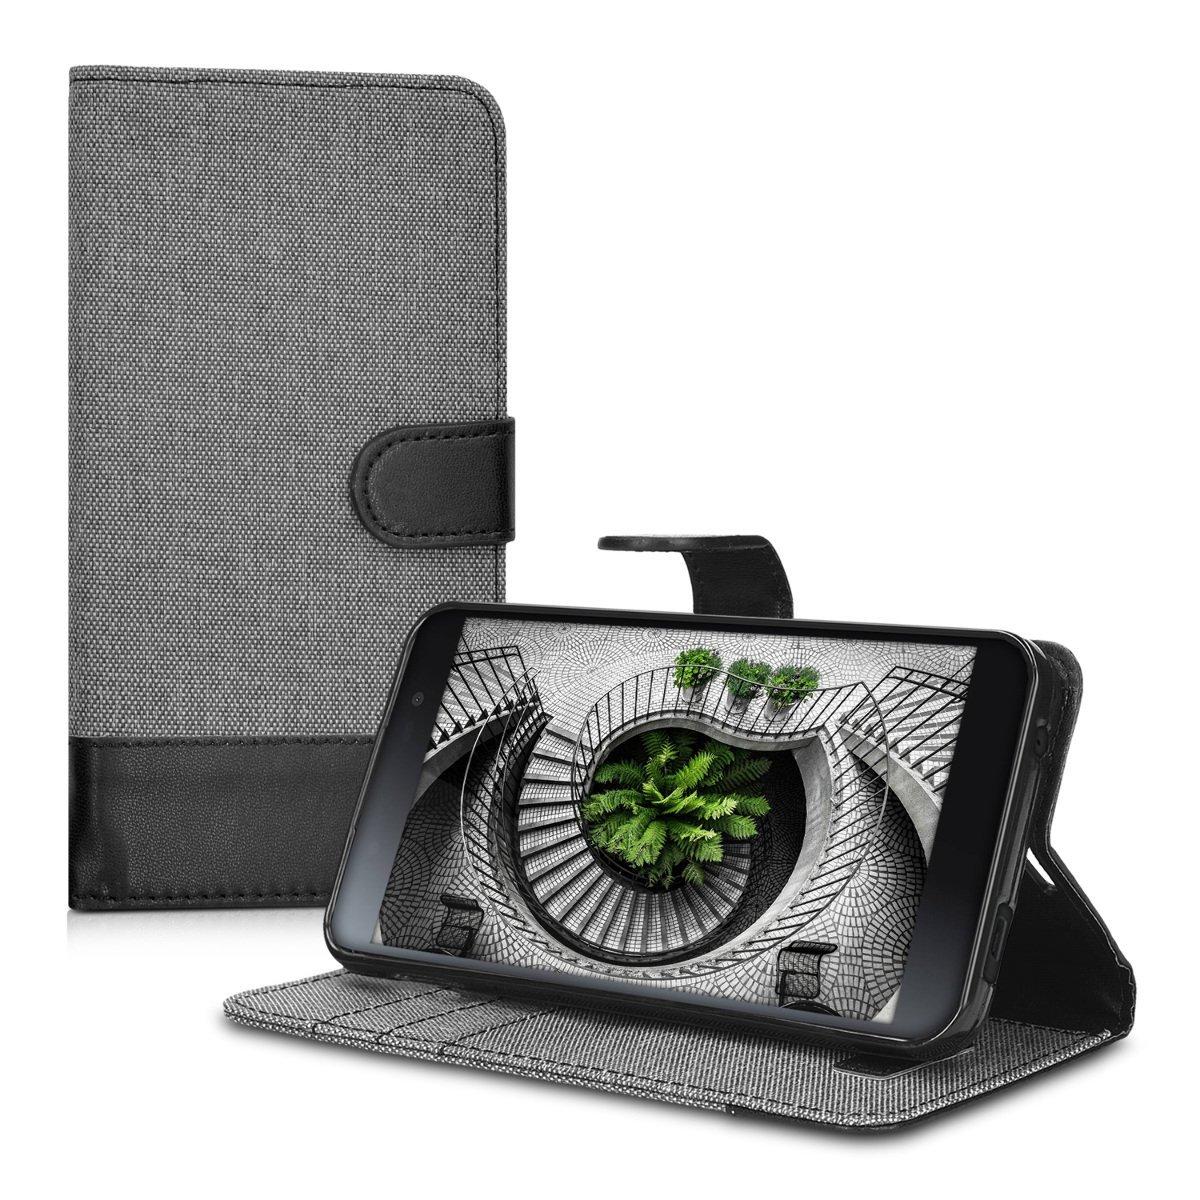 KW Θήκη Blackberry DTEK50 - Πορτοφόλι (39325.22) - Grey/Black